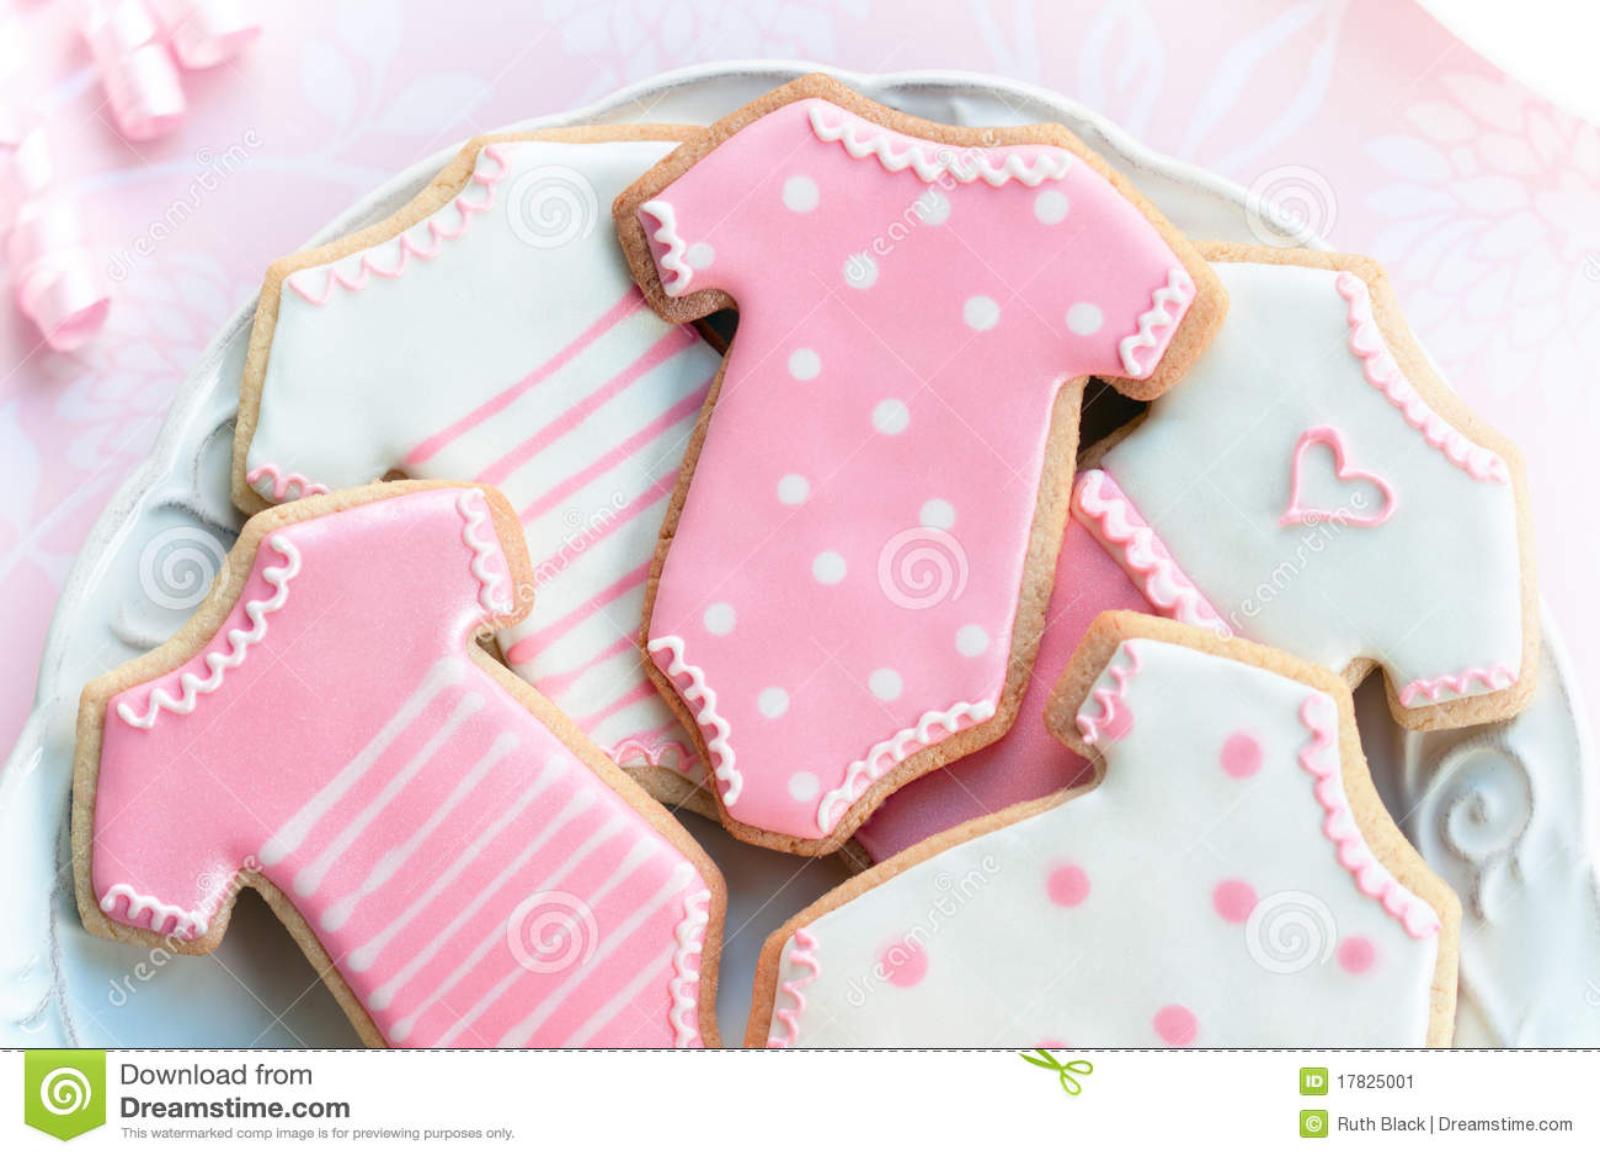 Babyshower Cookies Stock Image Image Of Birthday Pale 17825001